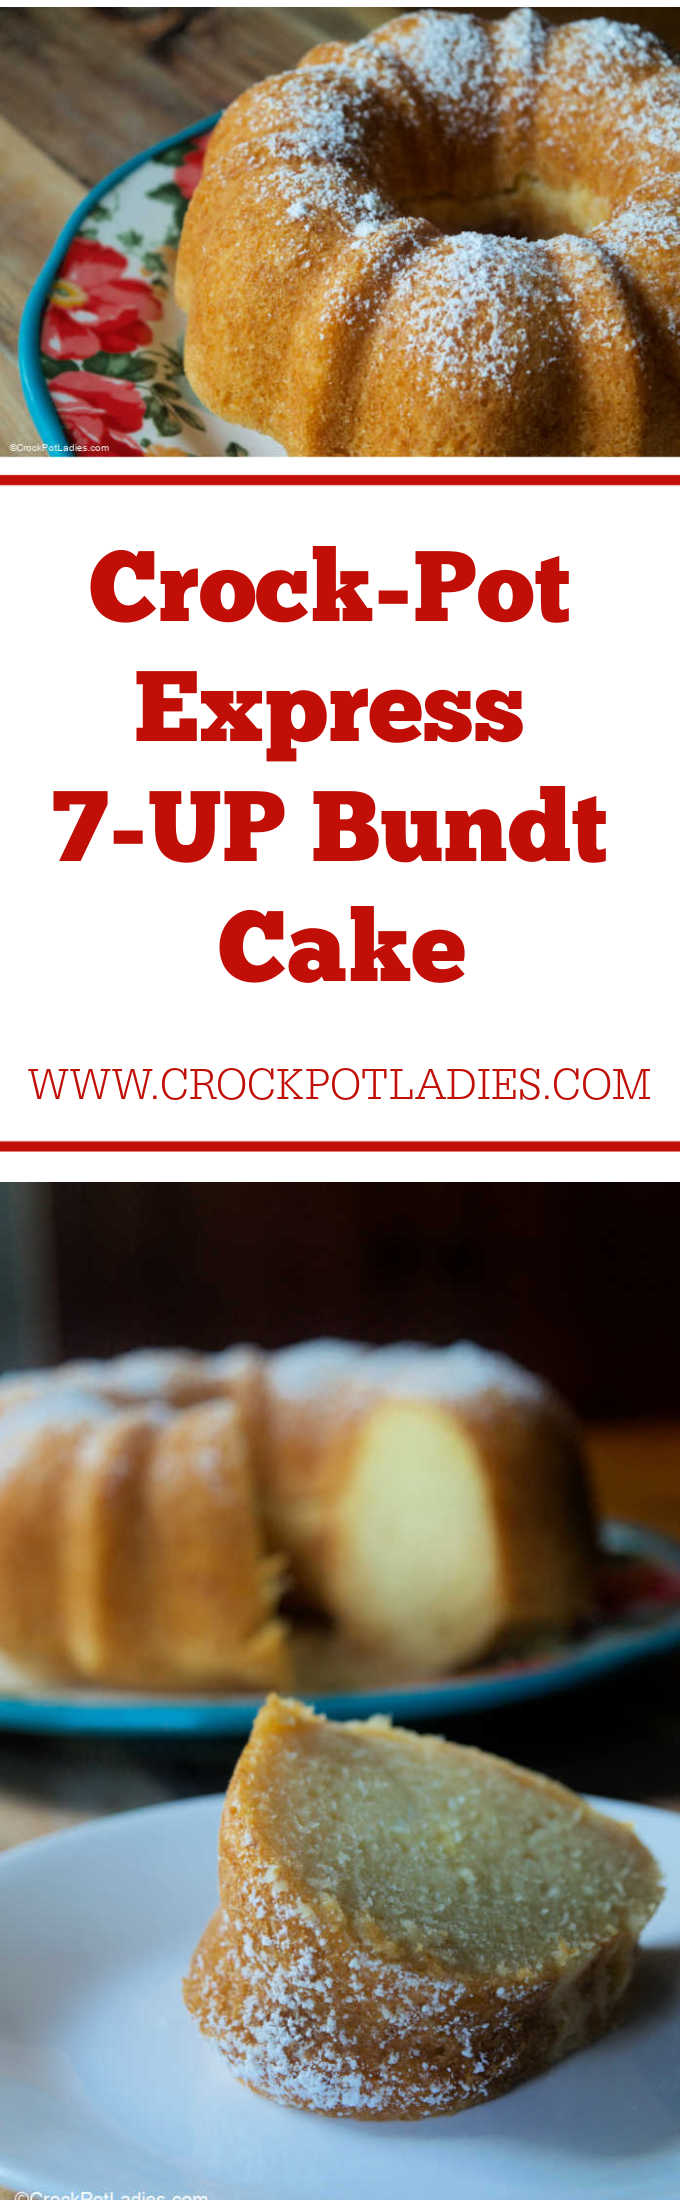 Crock-Pot Express 7-UP Bundt Cake